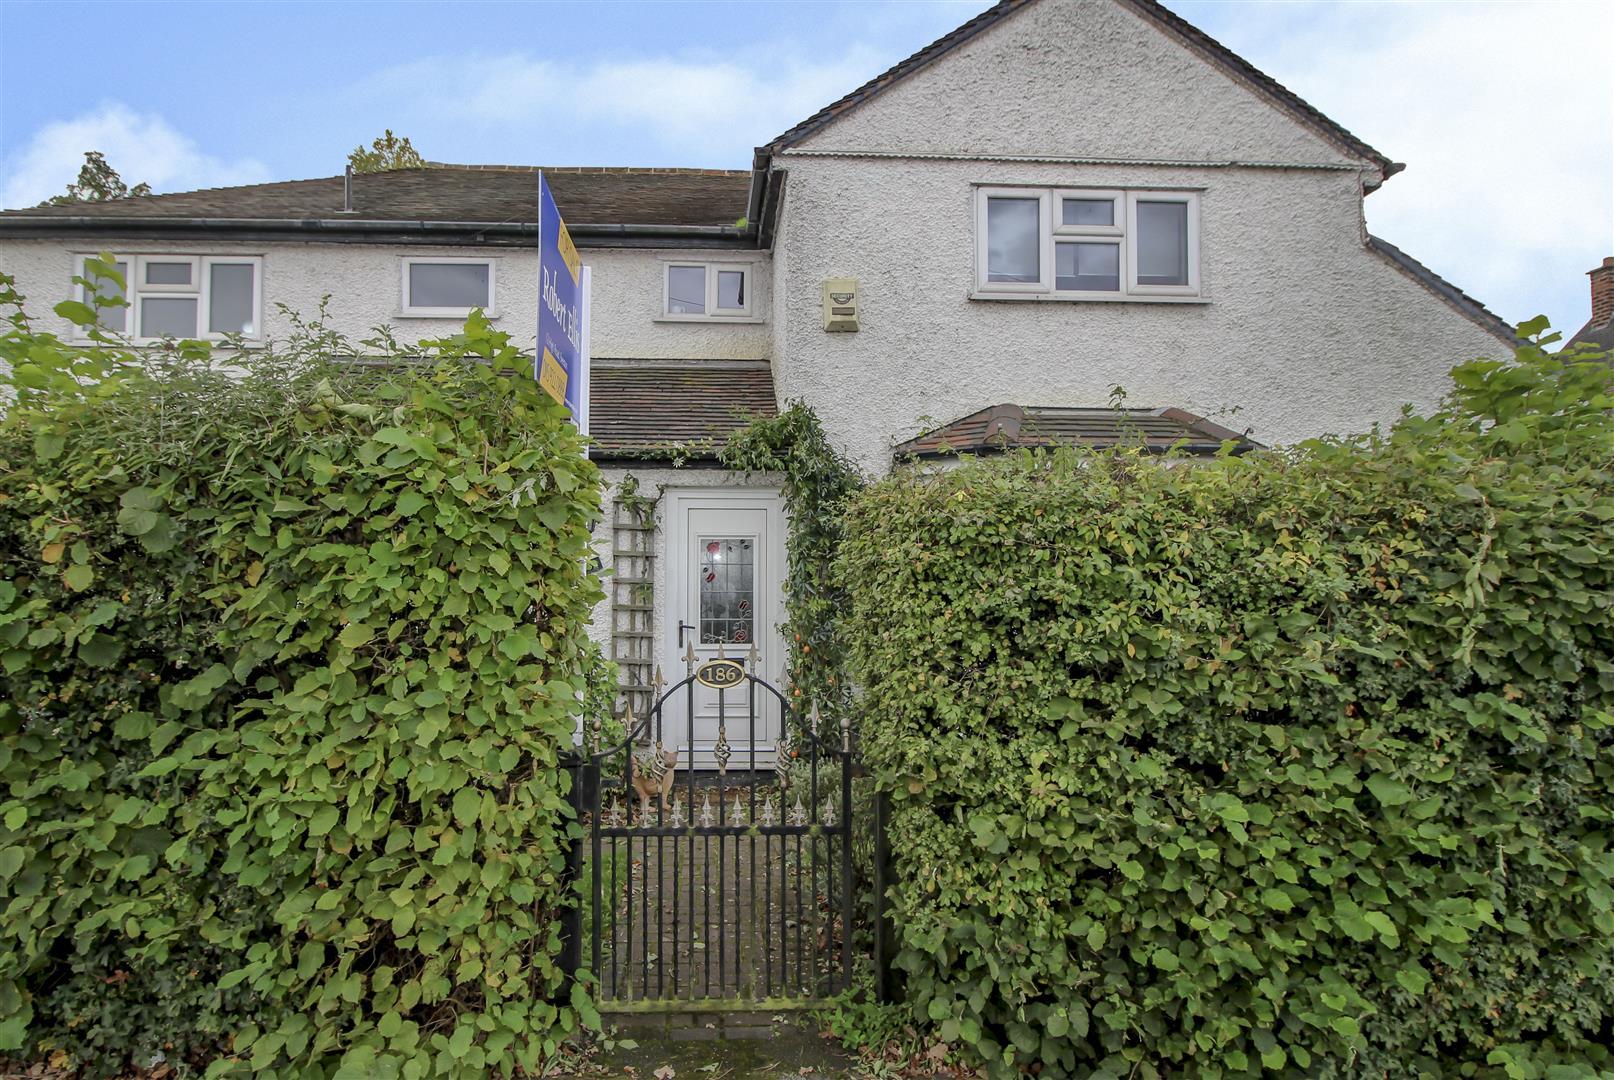 4 Bedrooms Detached House for sale in Attenborough Lane, Attenborough, Nottingham